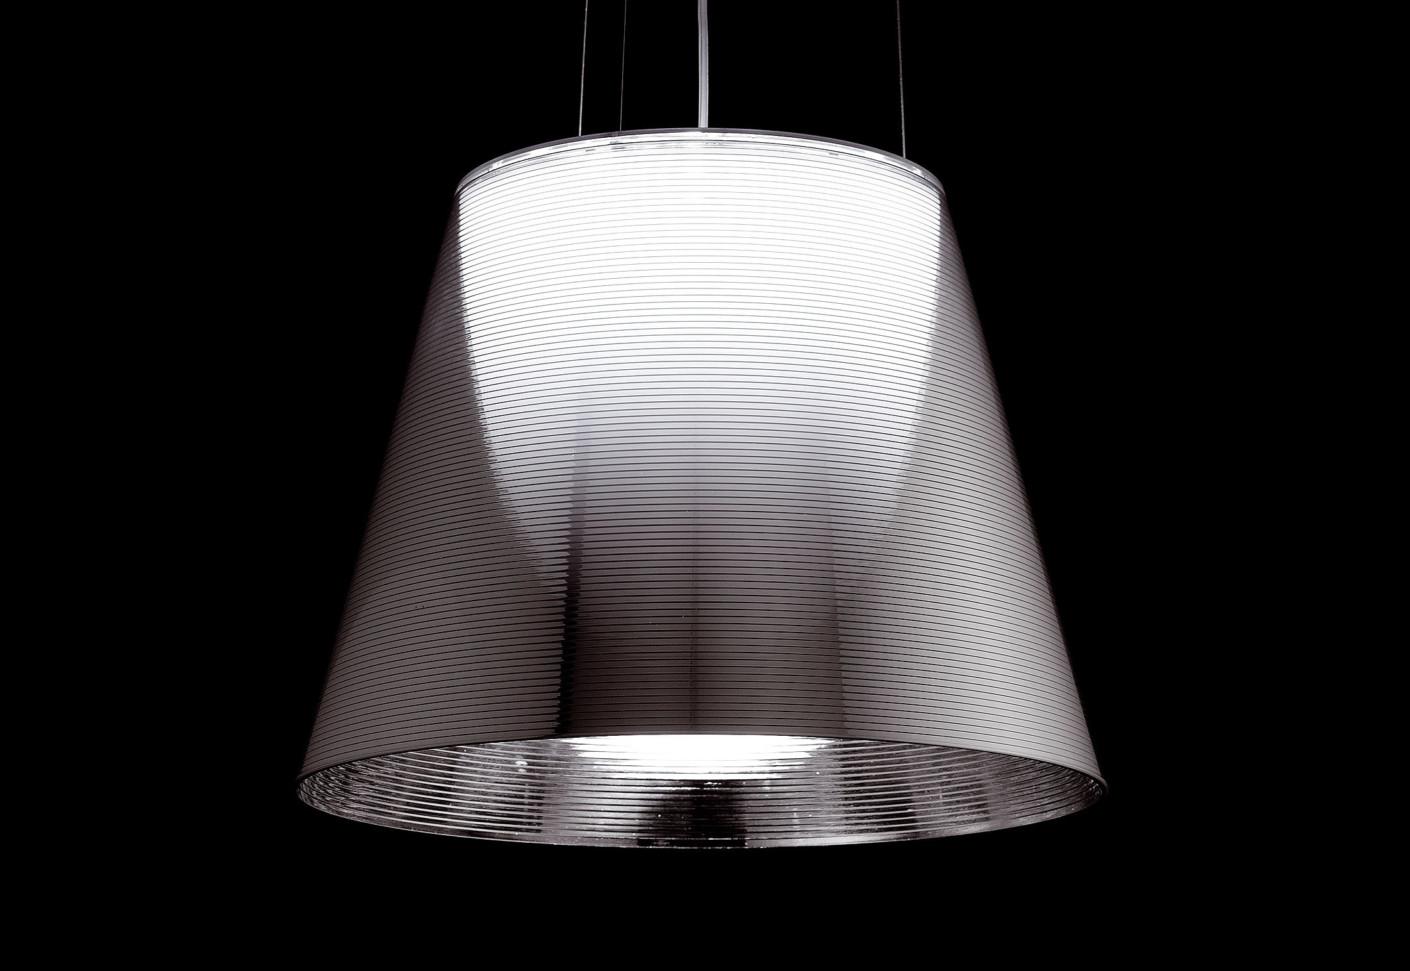 Ktribe S2 Suspension Lamp By Flos Stylepark